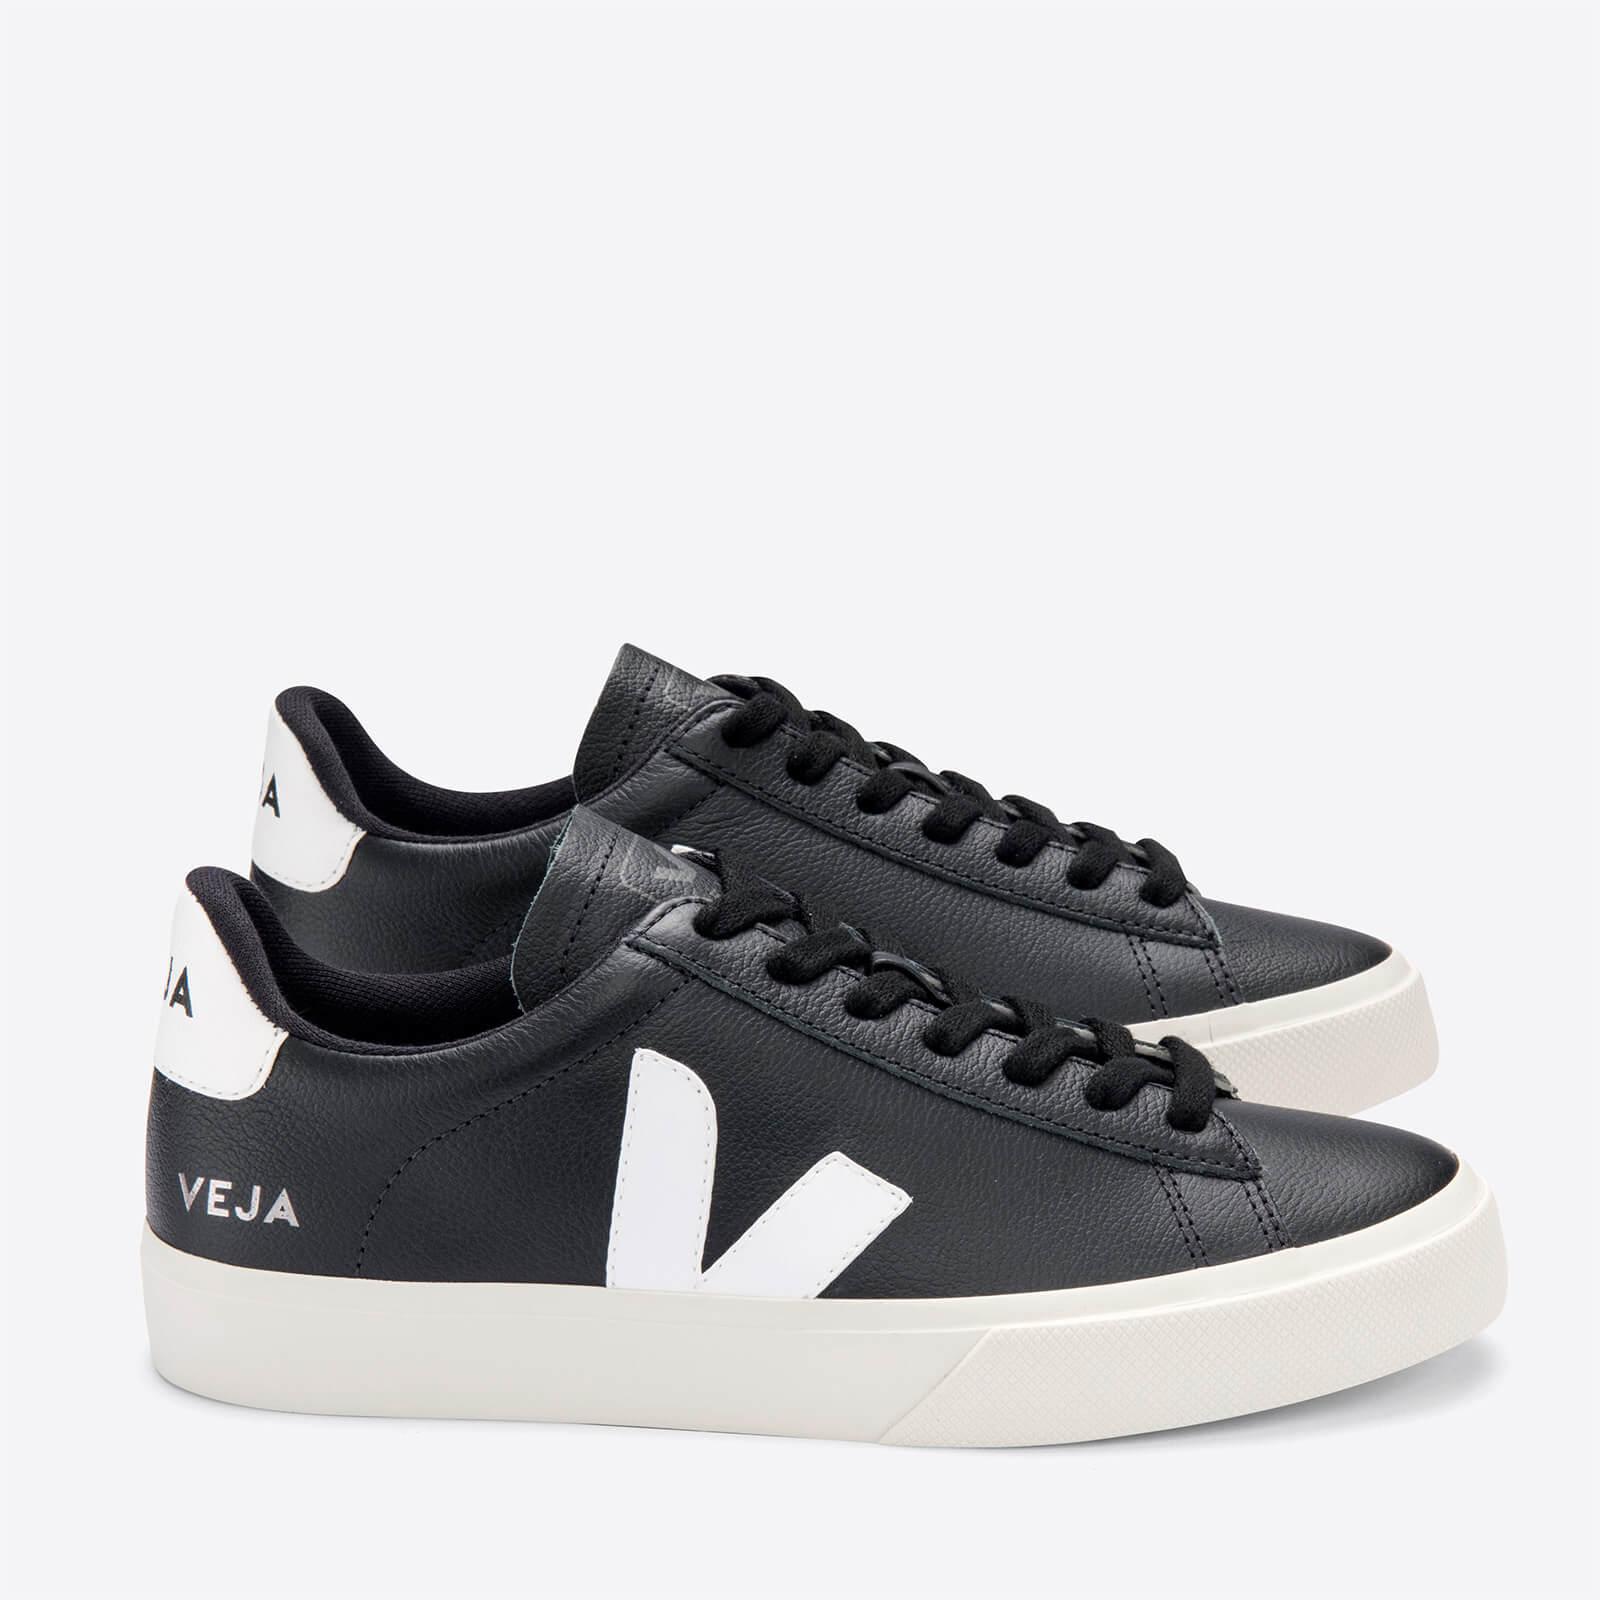 Veja Men's Campo Chrome Free Leather Trainers - Black/White - UK 9